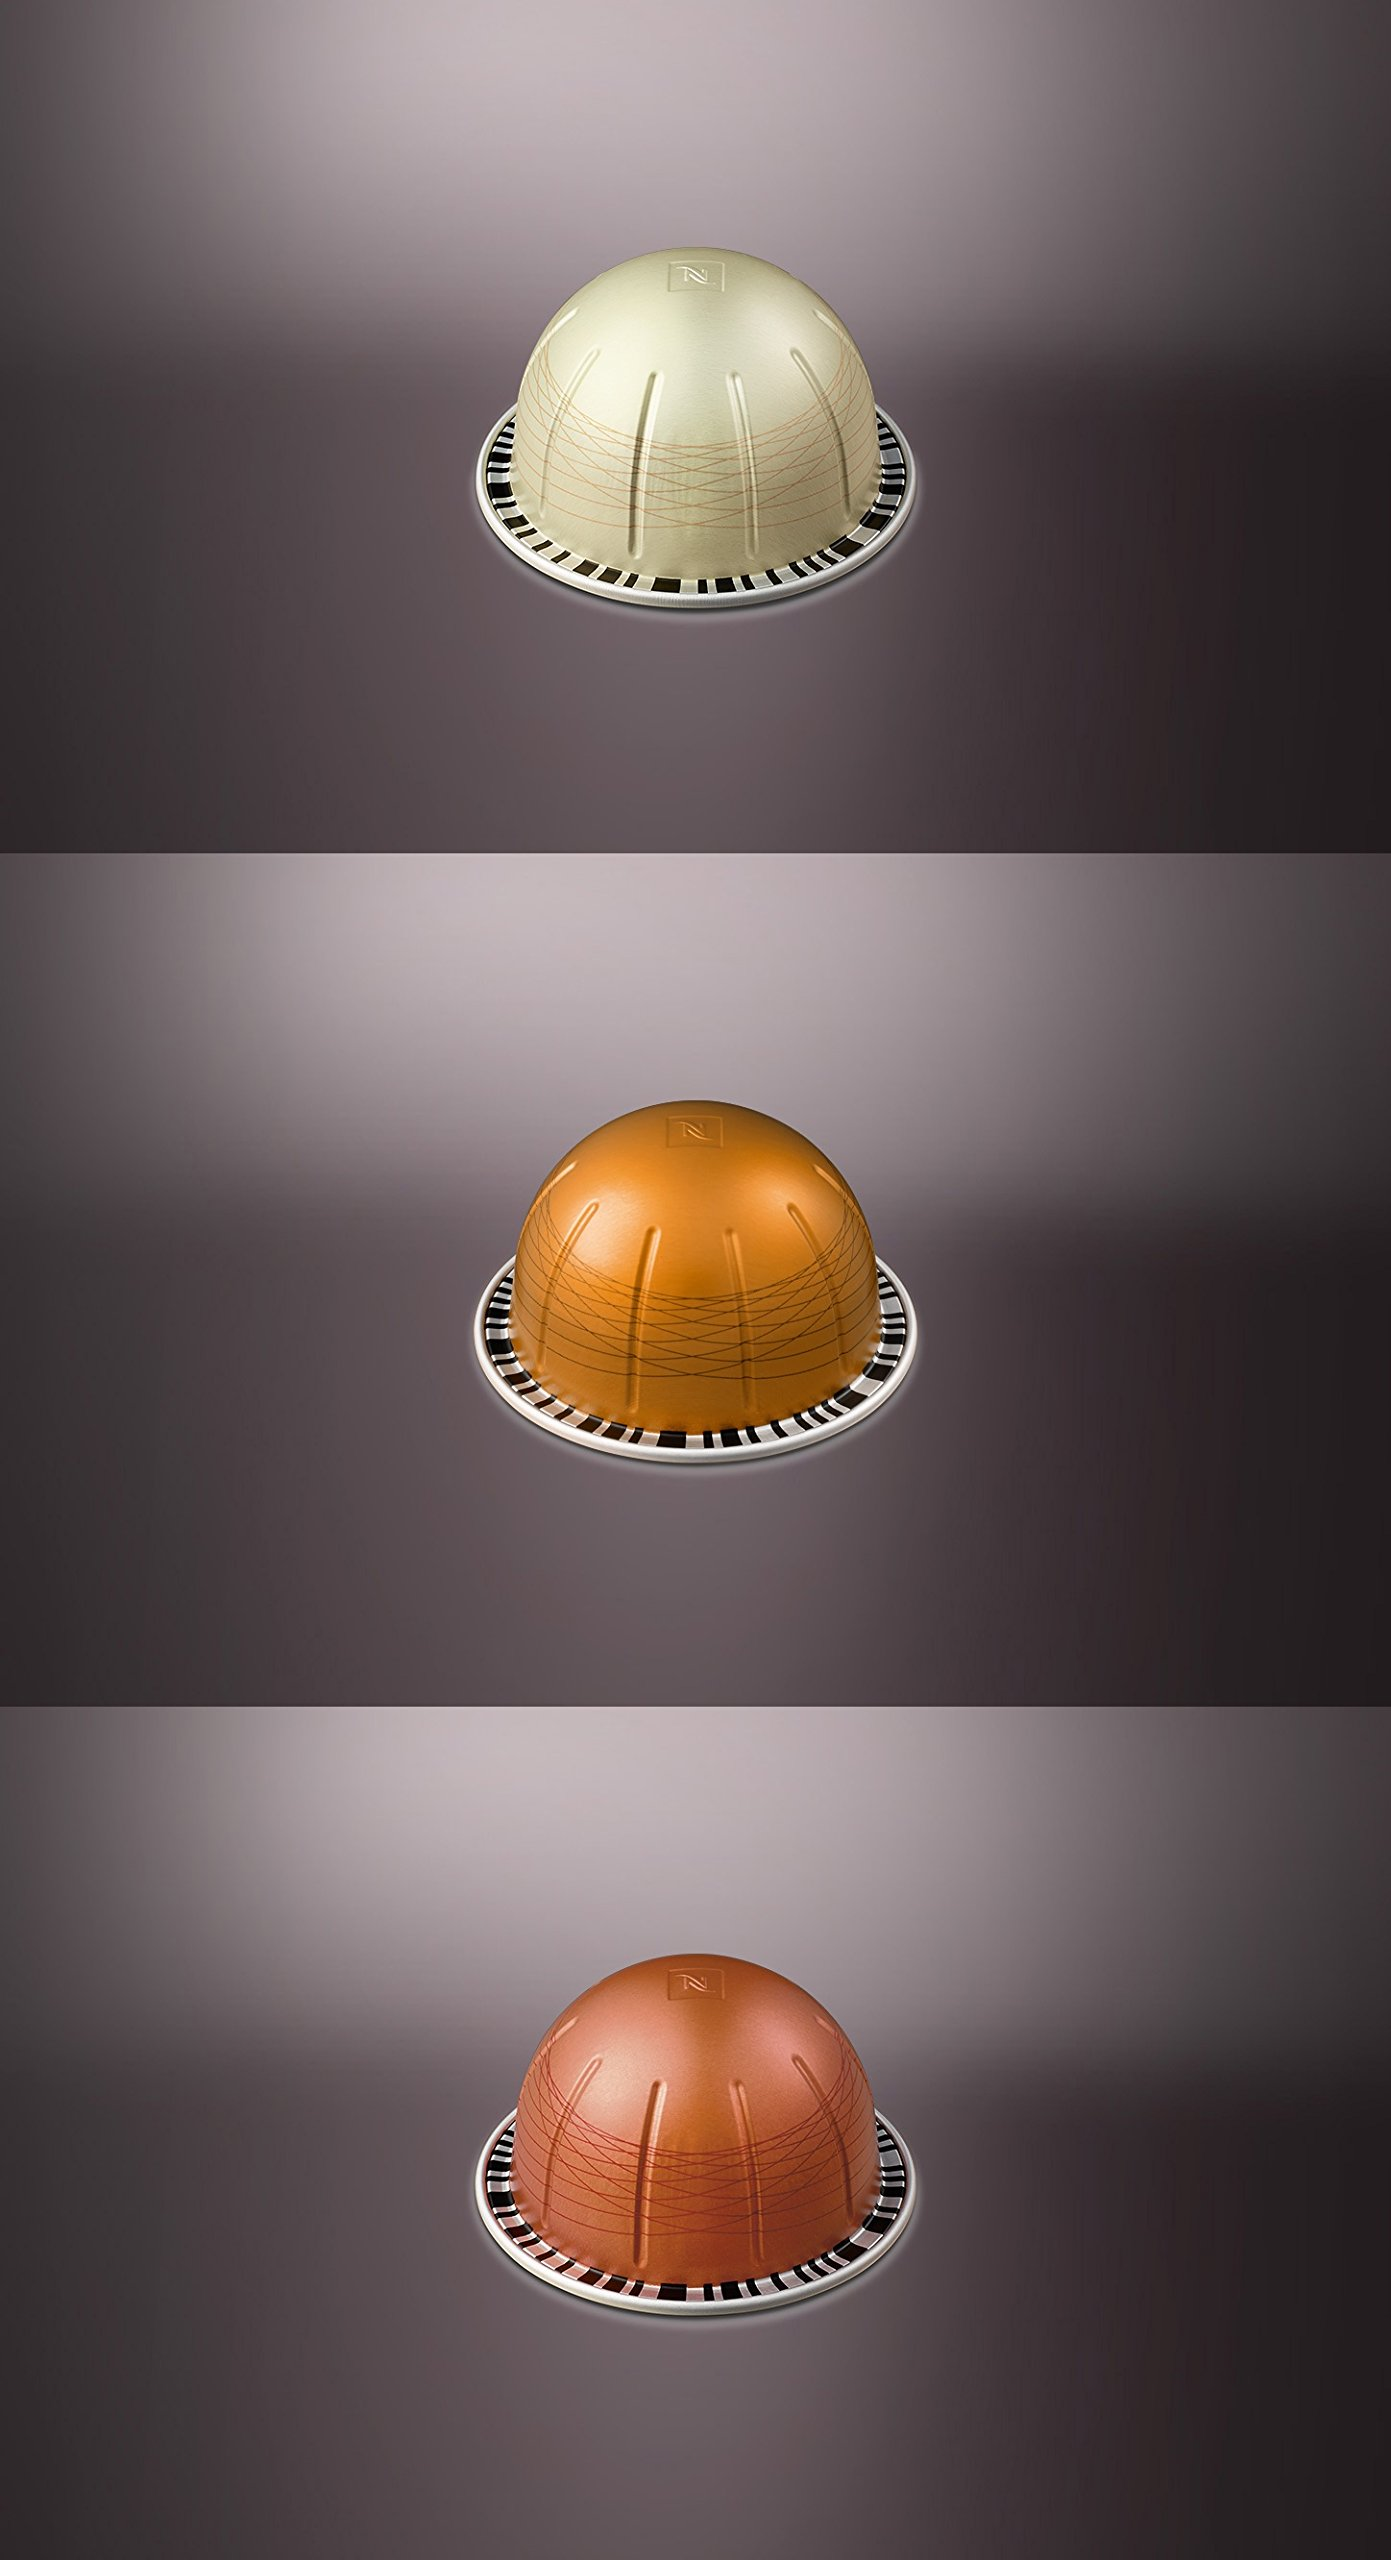 nespresso vertuoline espresso capsules the bold. Black Bedroom Furniture Sets. Home Design Ideas